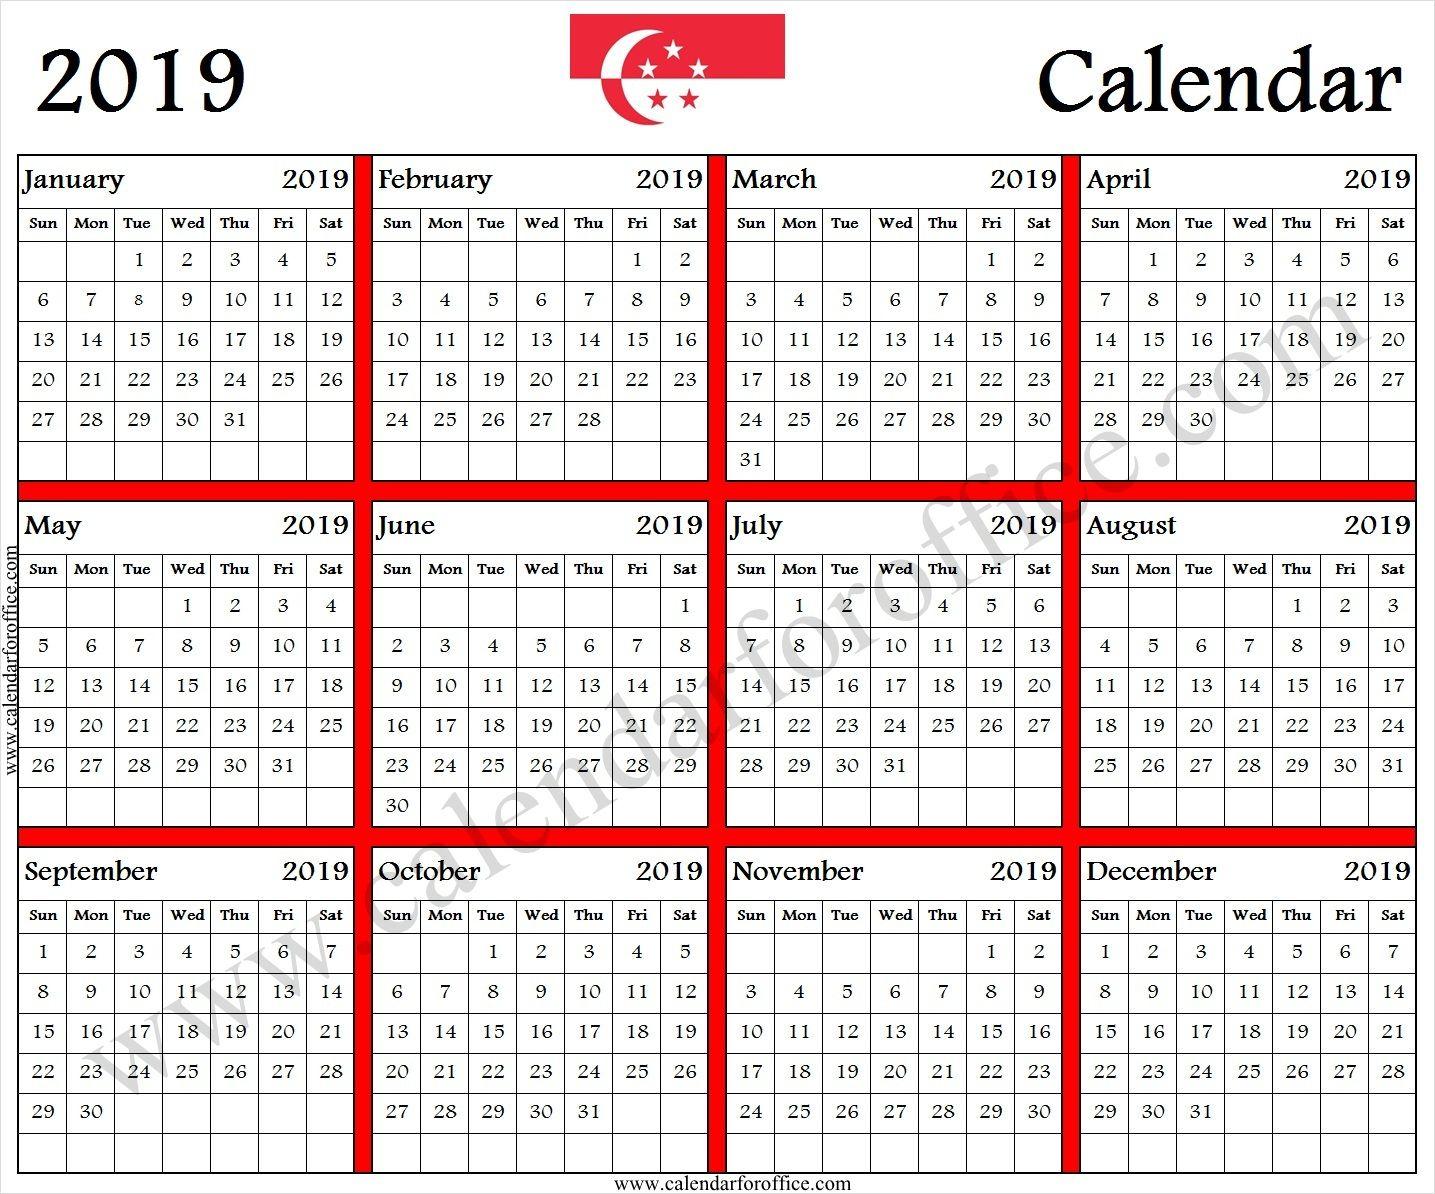 2019 Calendar Singapore Printable 2019 Calendar Calendar Template Printable